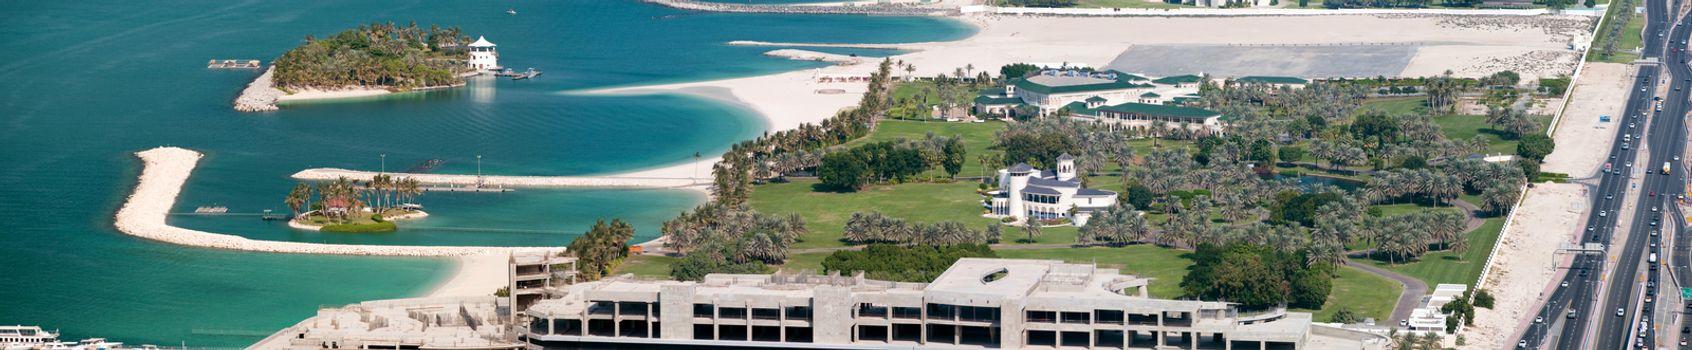 View on Beach Palace of His Highness Sheikh Mohammed Bin Rashid Al Maktoum in Dubai, United Arab Emirates